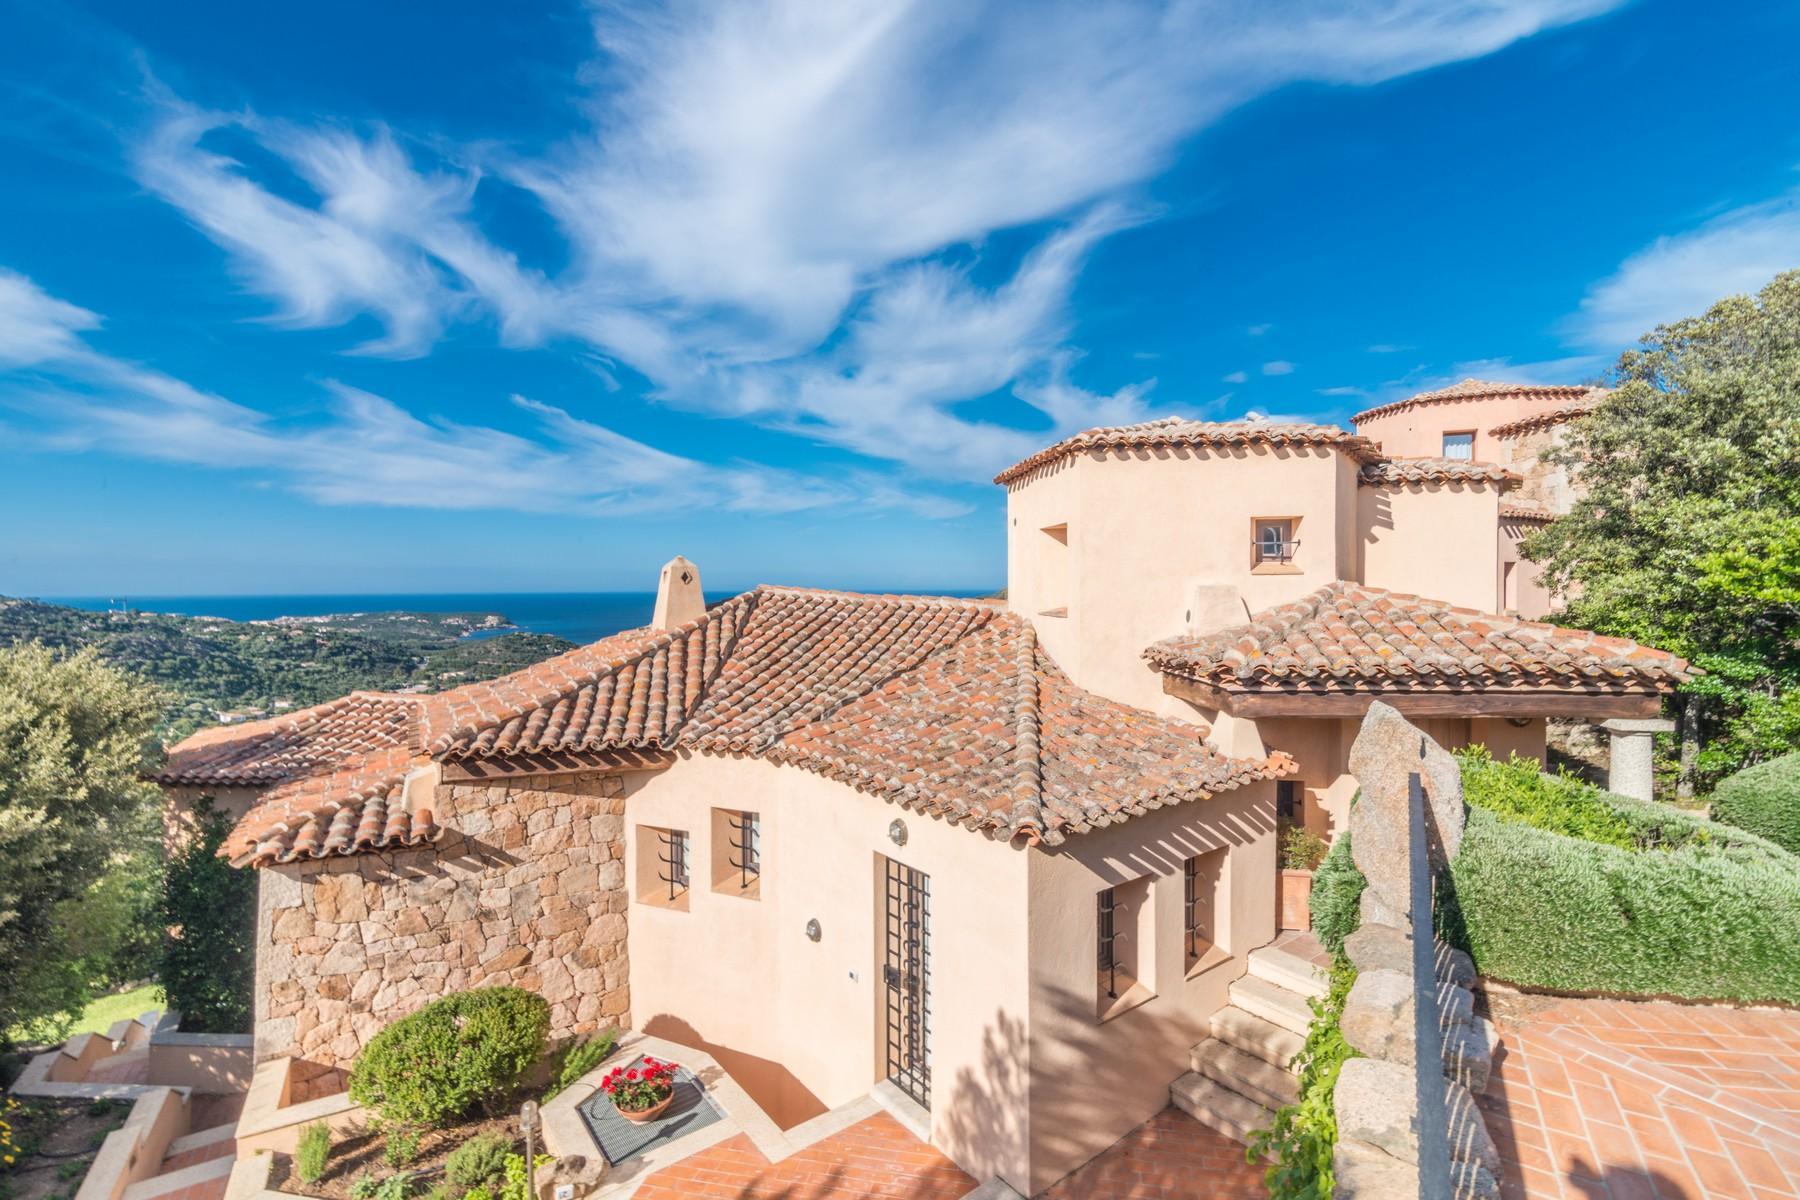 Porto Cervo Abbiadori Splendide villa jumelée avec vue sur le golfe de Pevero - 36